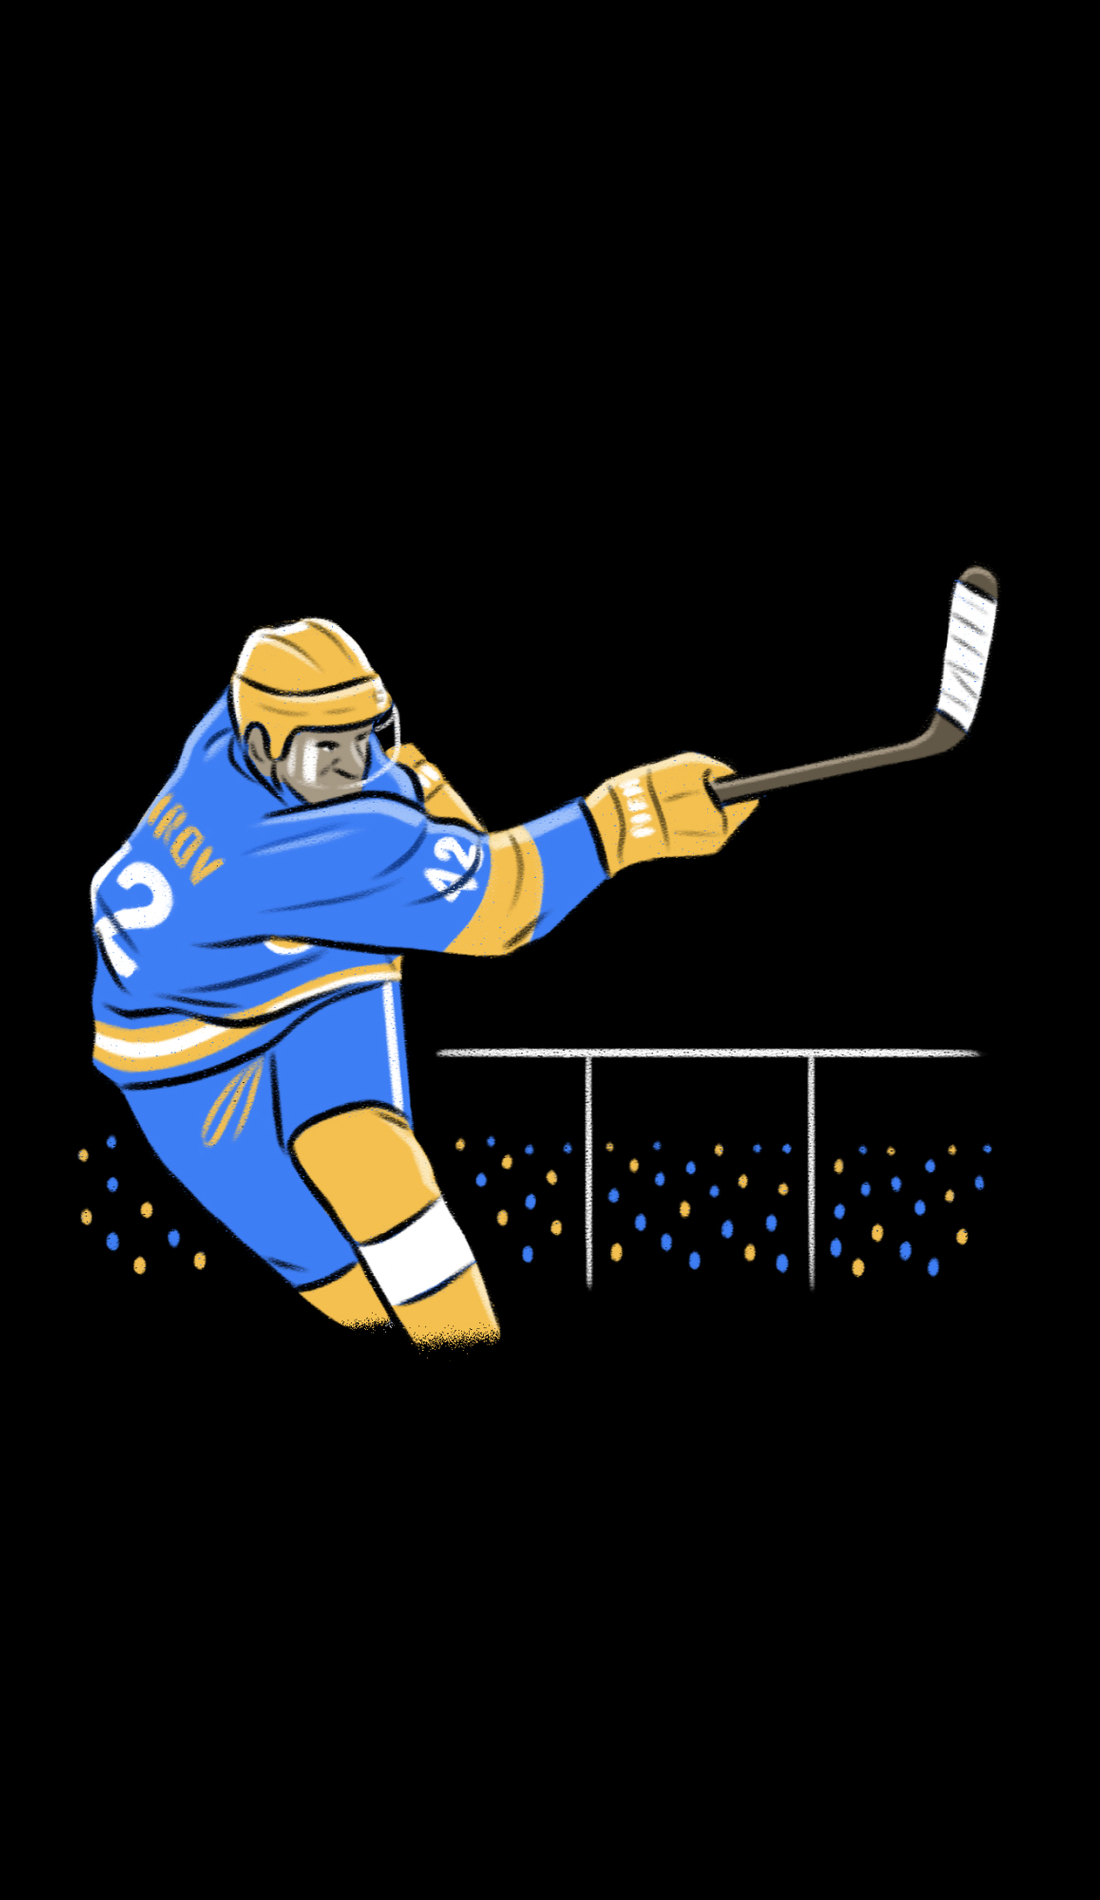 A Harvard Crimson Hockey live event